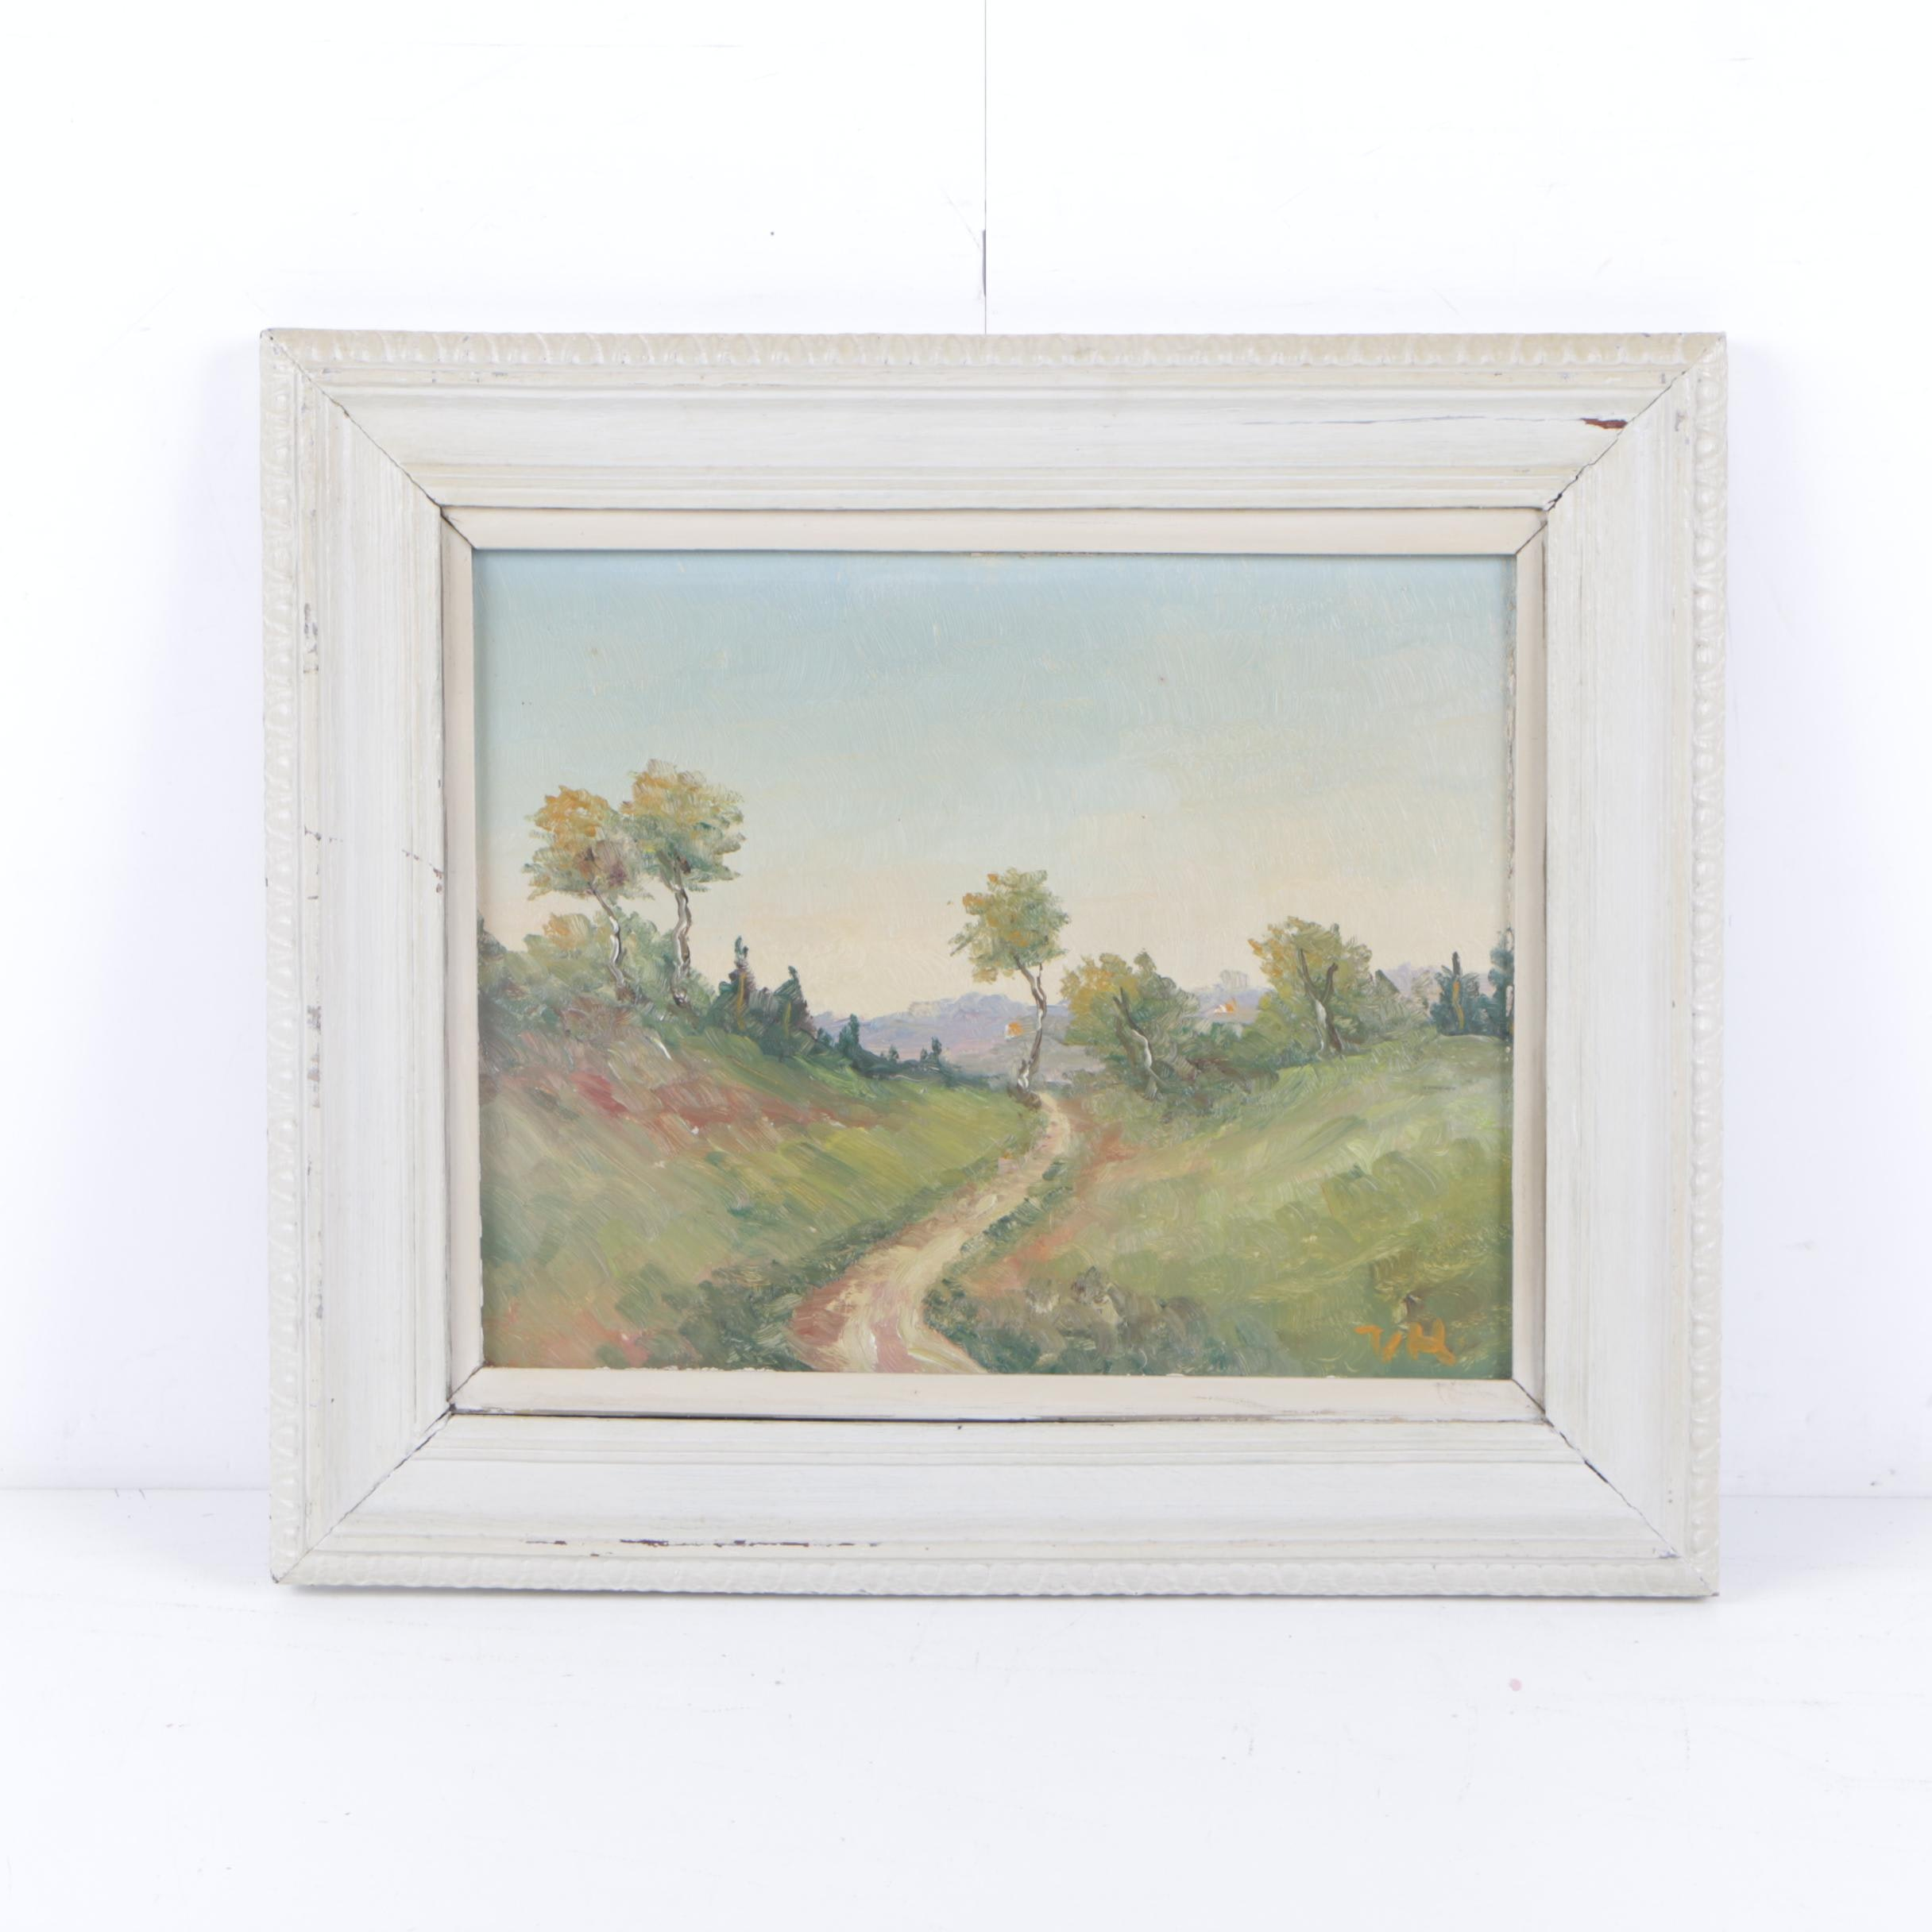 V. Hartnack 1920s Oil Painting of Impressionist Style Landscape